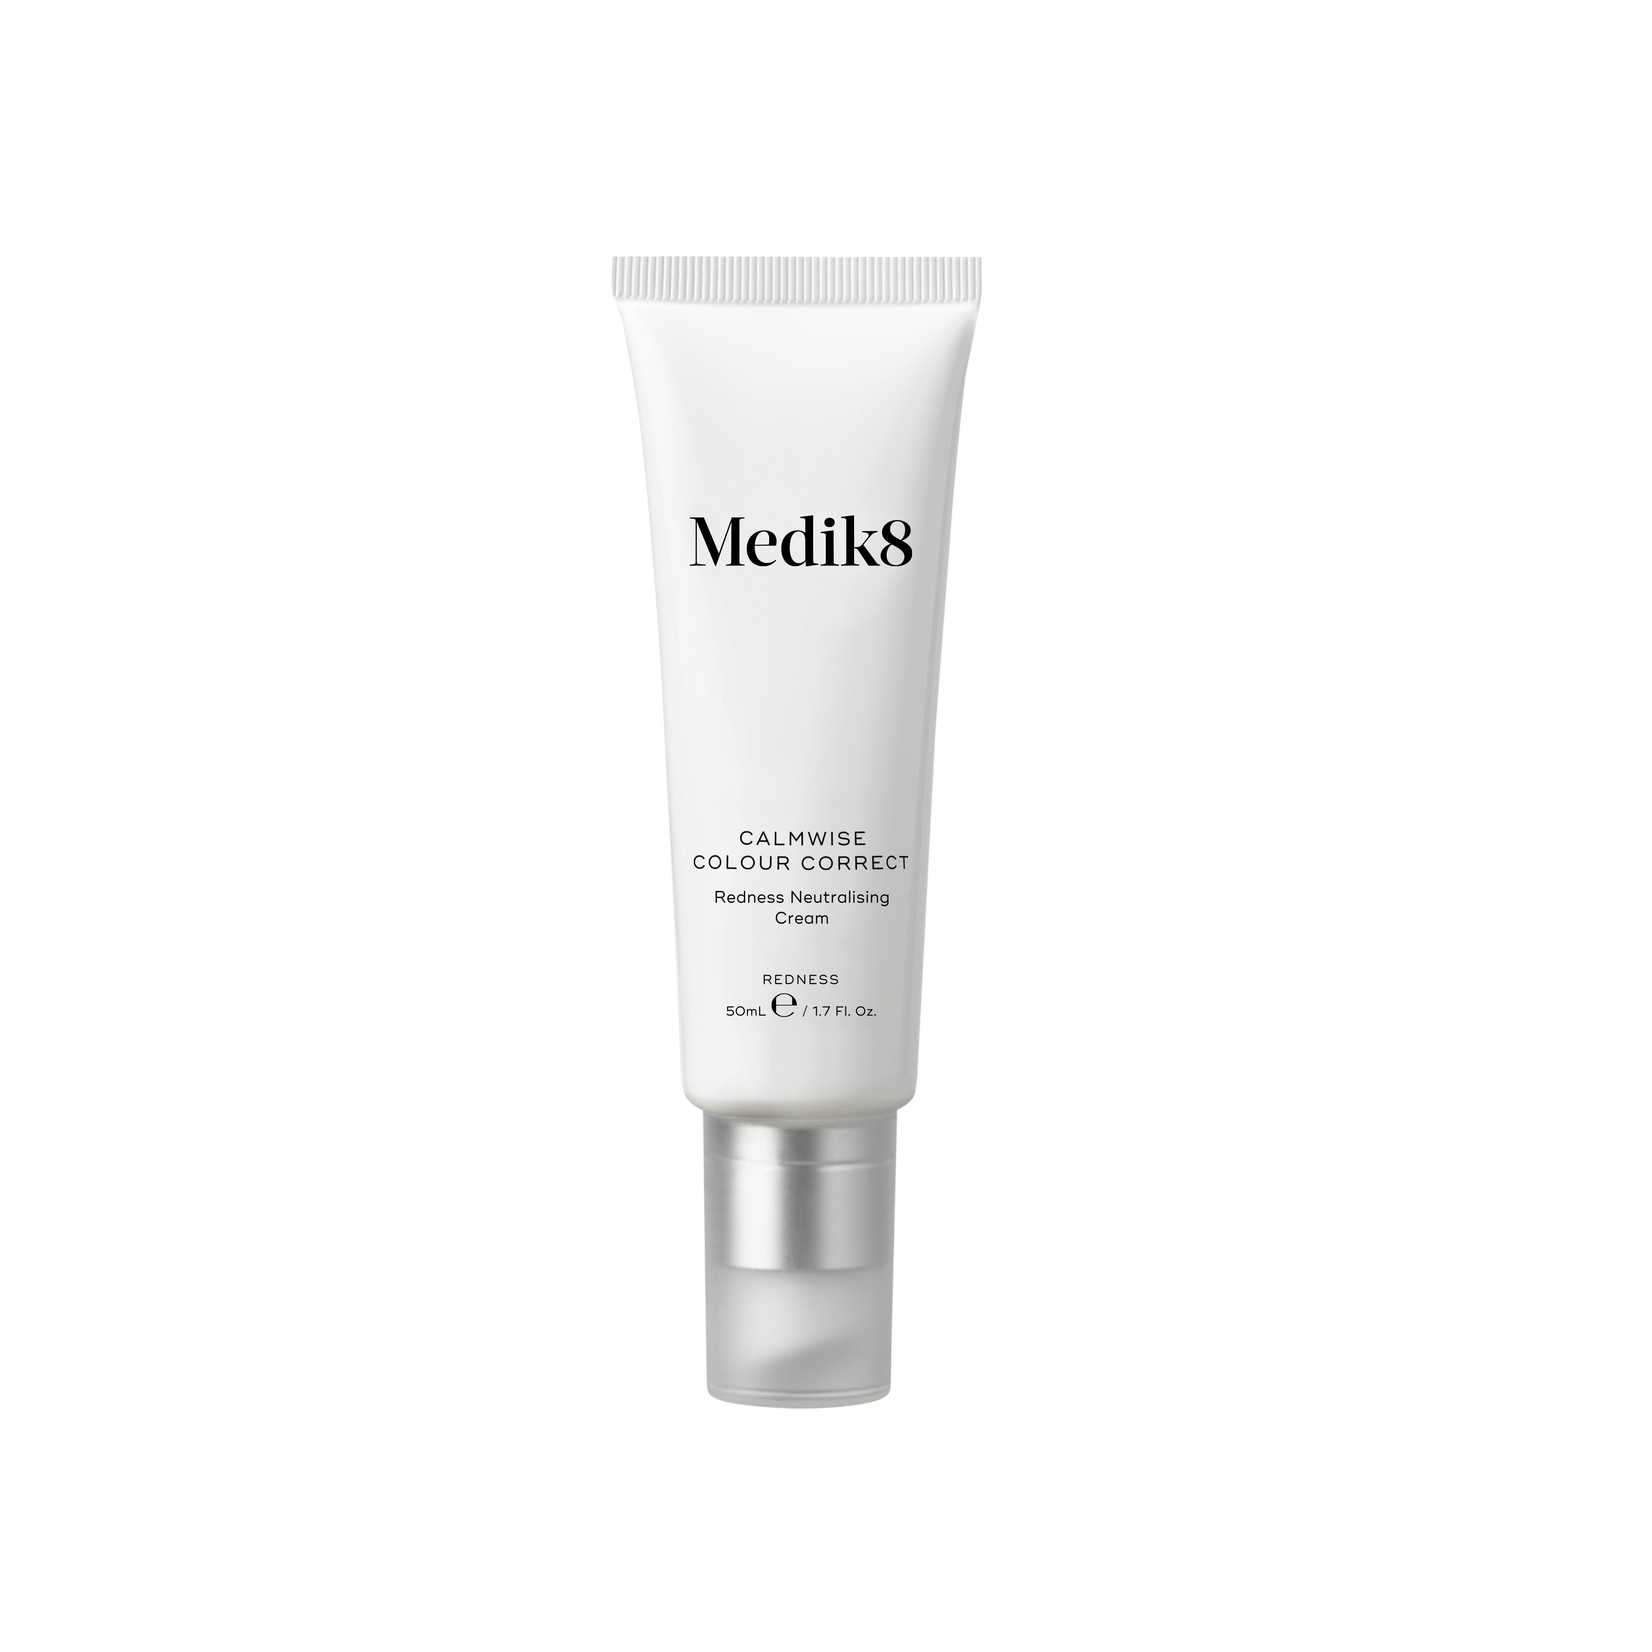 Medik8 Medik8 Calmwise Colour Correct 50ml voor roodheid en blozende huid